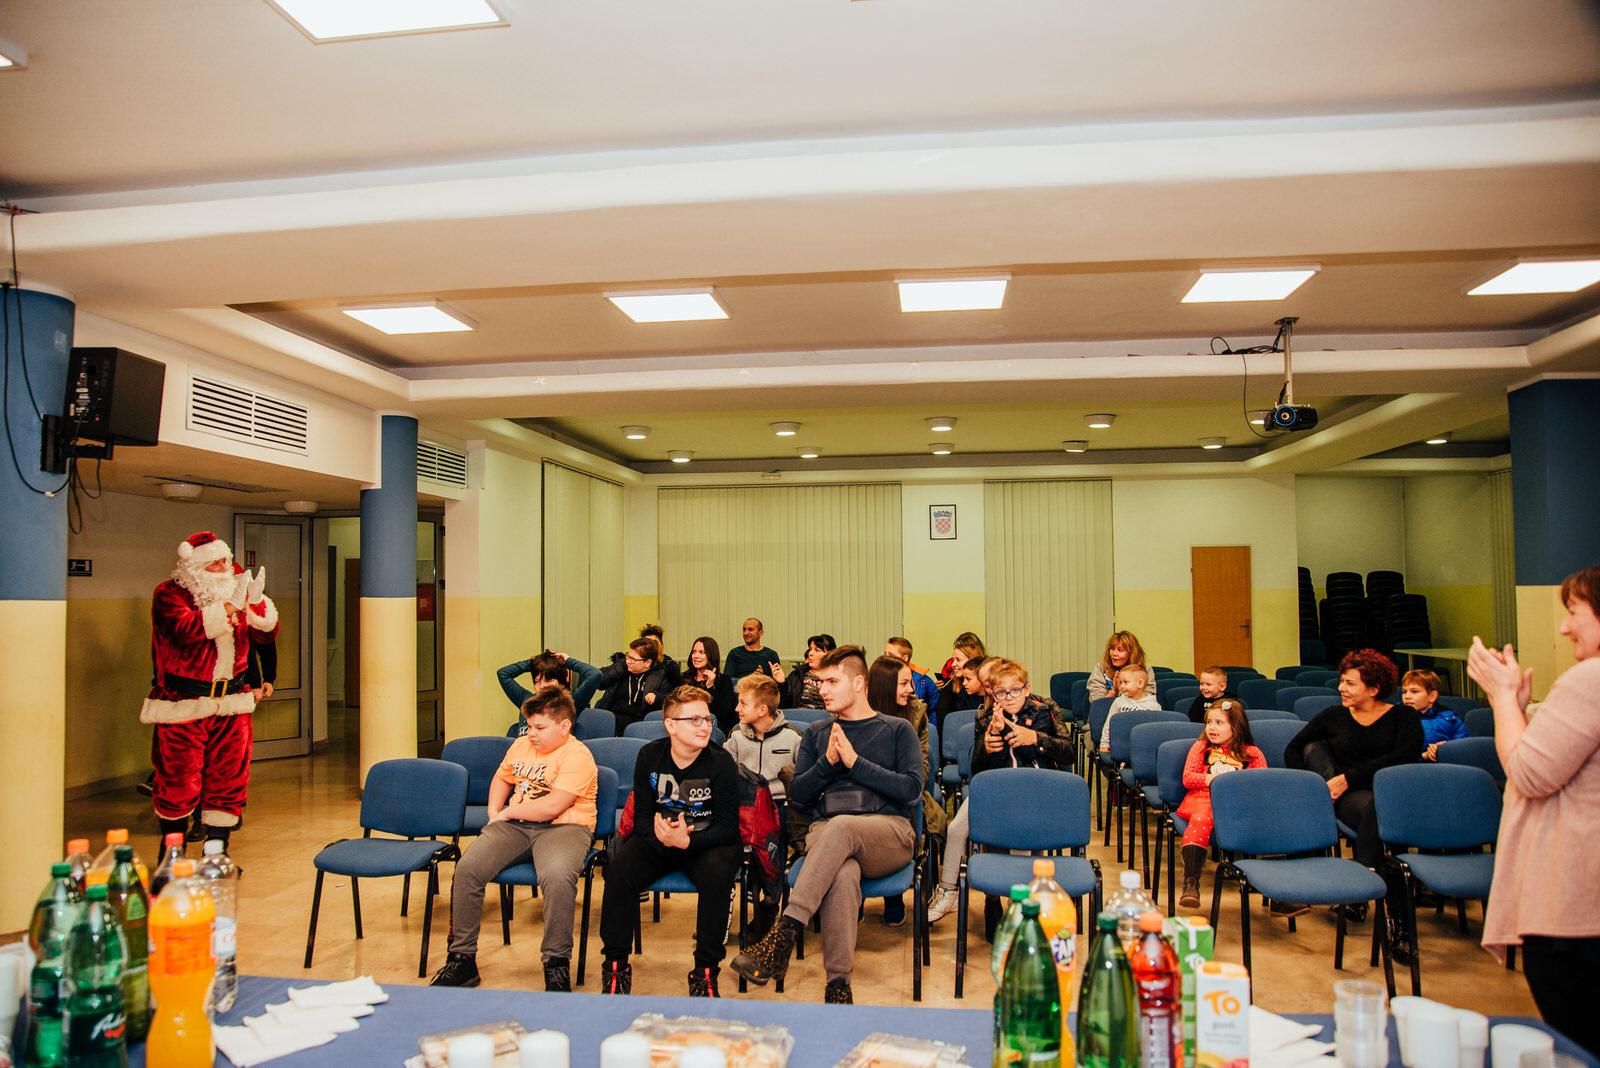 likaclub_airsoft-team-gospić-i-udruga-pčelice_2019-10